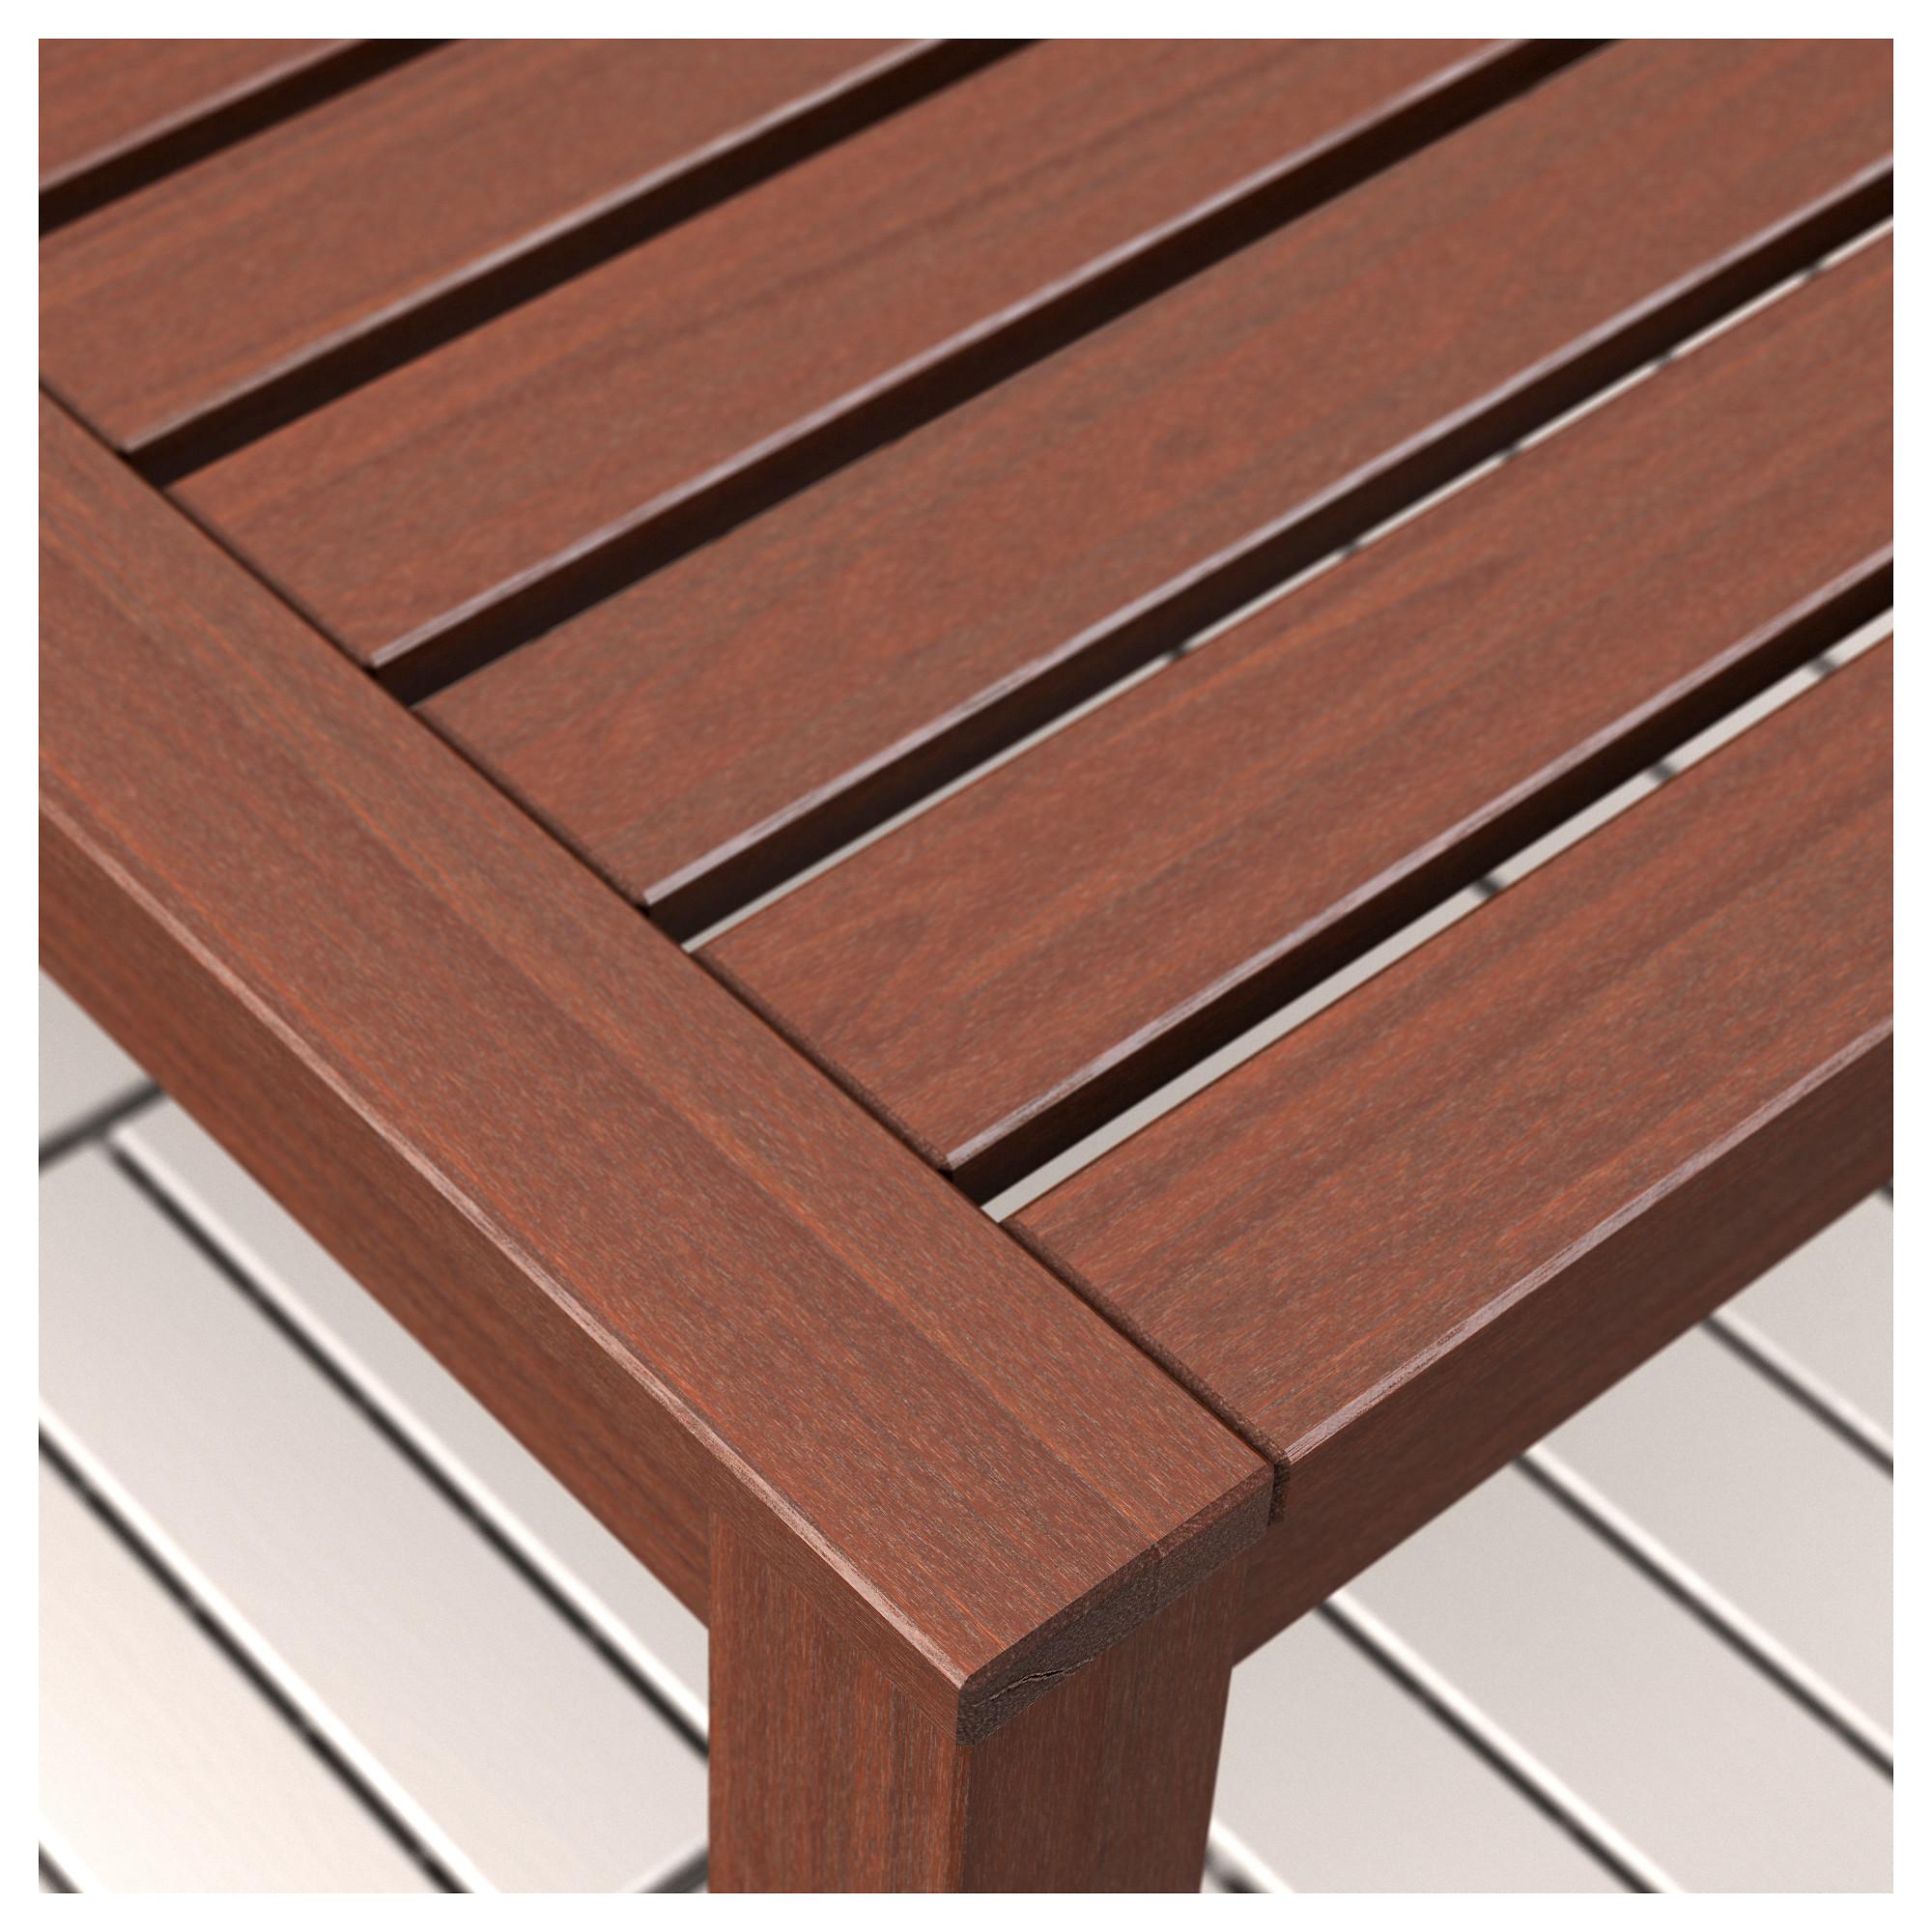 Стол + 8 кресел ЭПЛАРО артикуль № 792.289.29 в наличии. Онлайн каталог IKEA РБ. Недорогая доставка и установка.